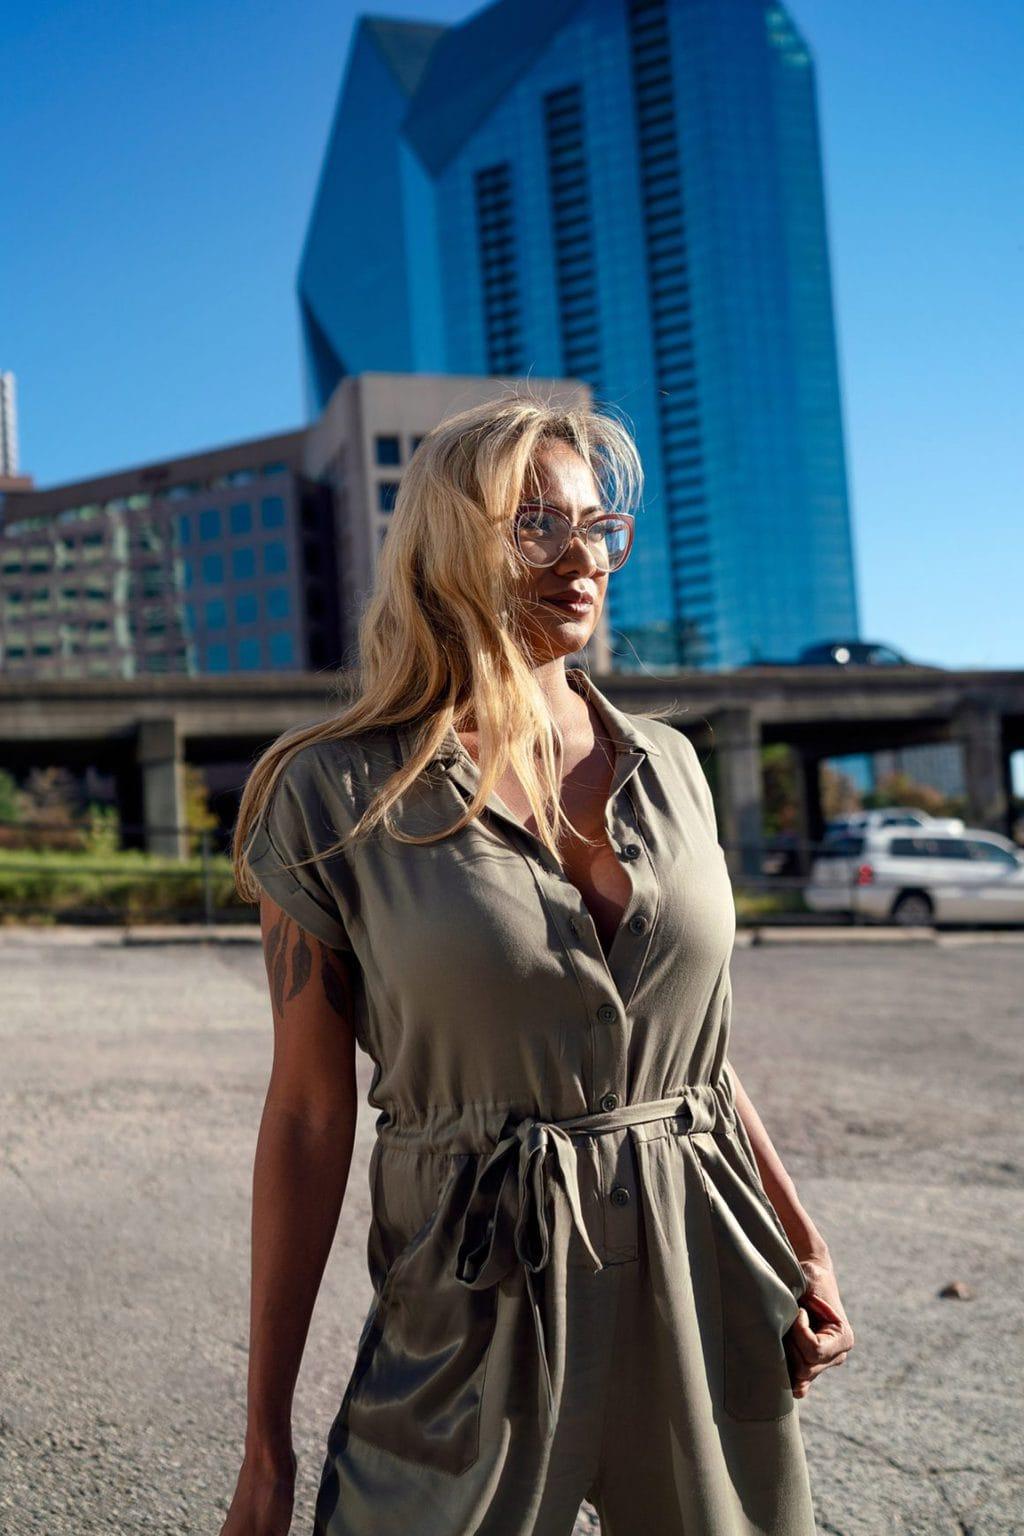 city environment portrait shoot sony 16-35mm f2.8